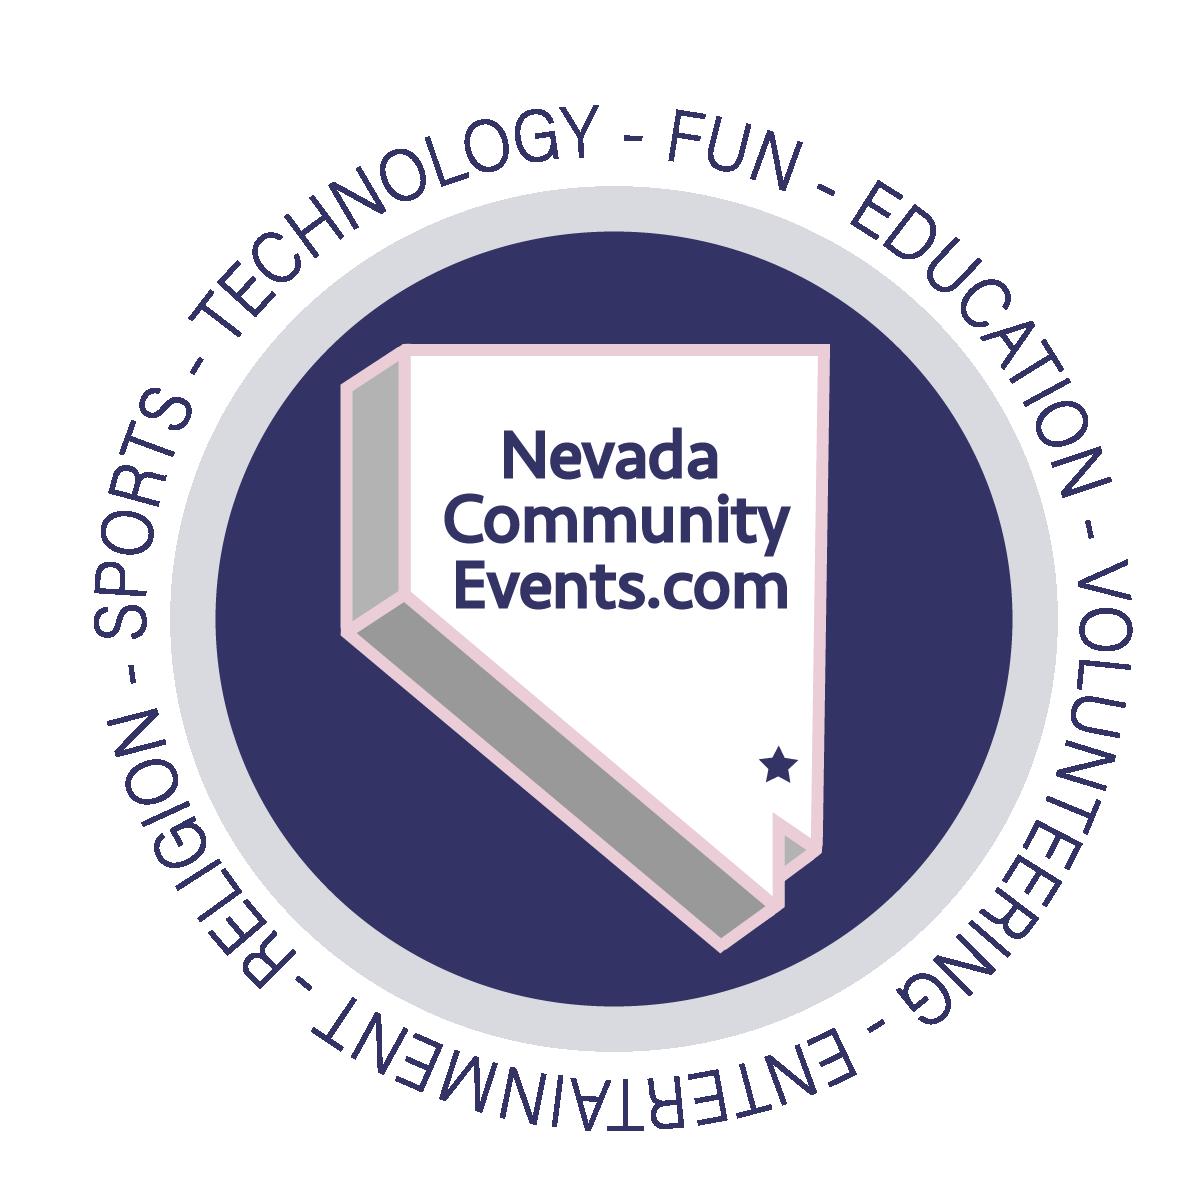 Nevada Community Events